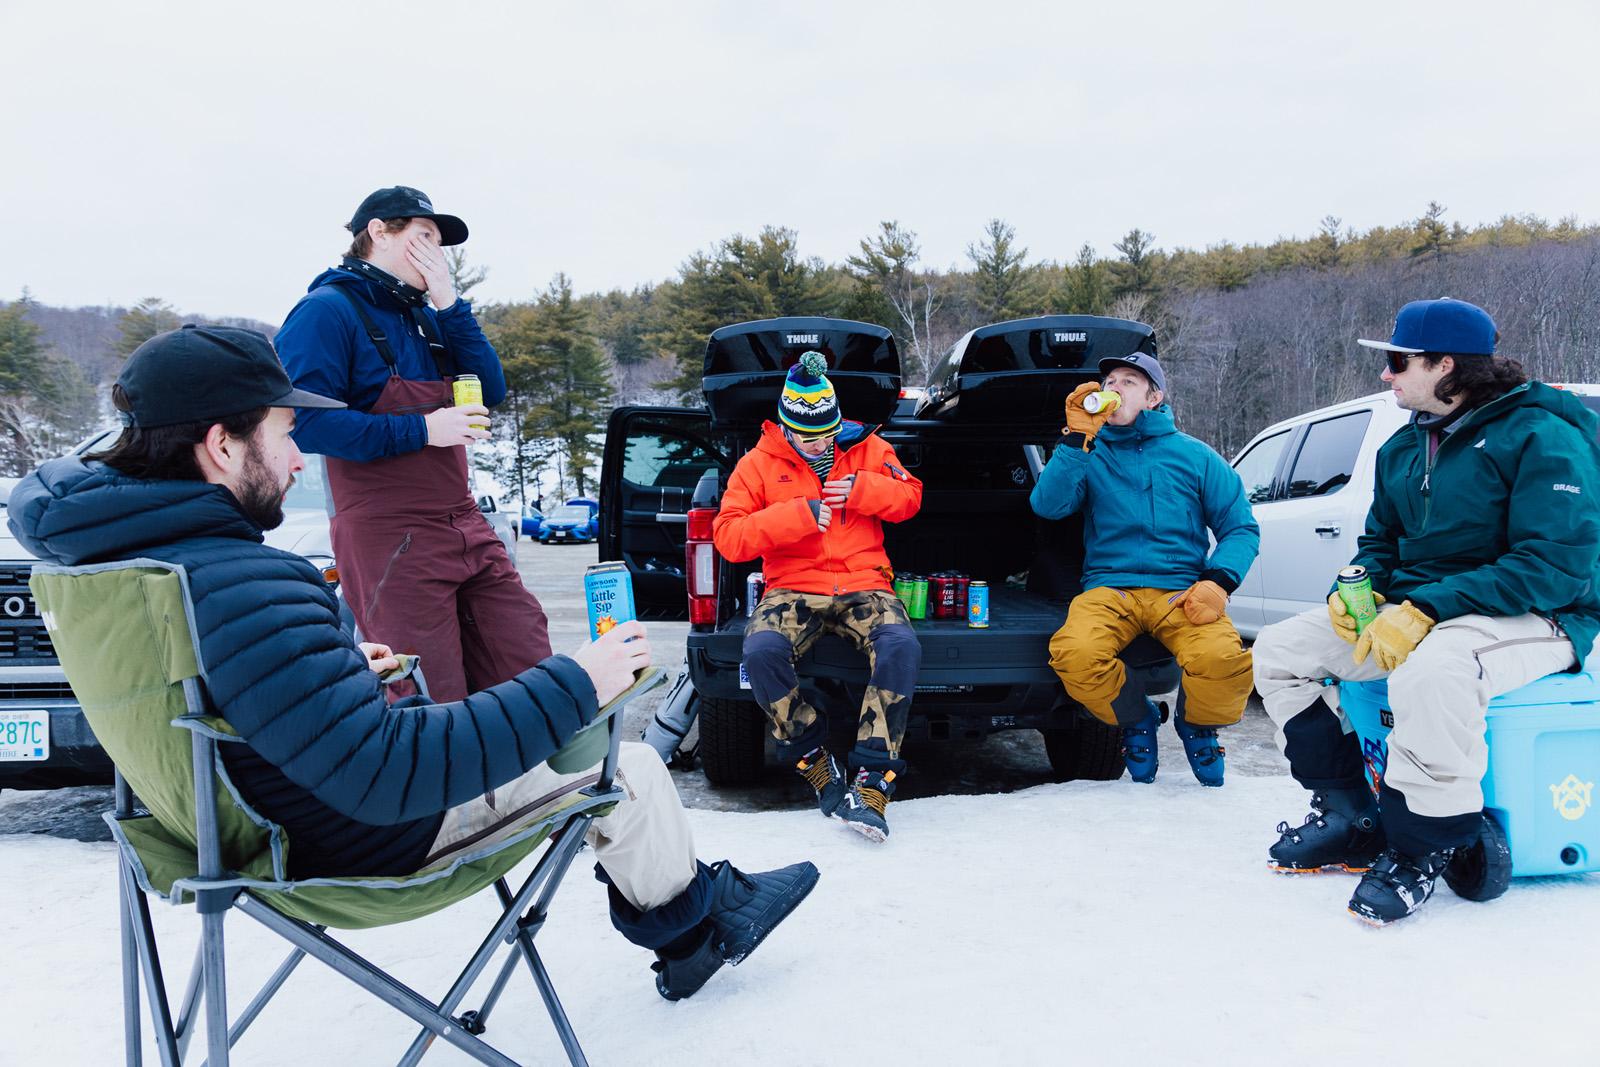 skiing, ski test, ski testing, fischer, the ski monster, apres ski, apres, beer, Lawsons finest liquids